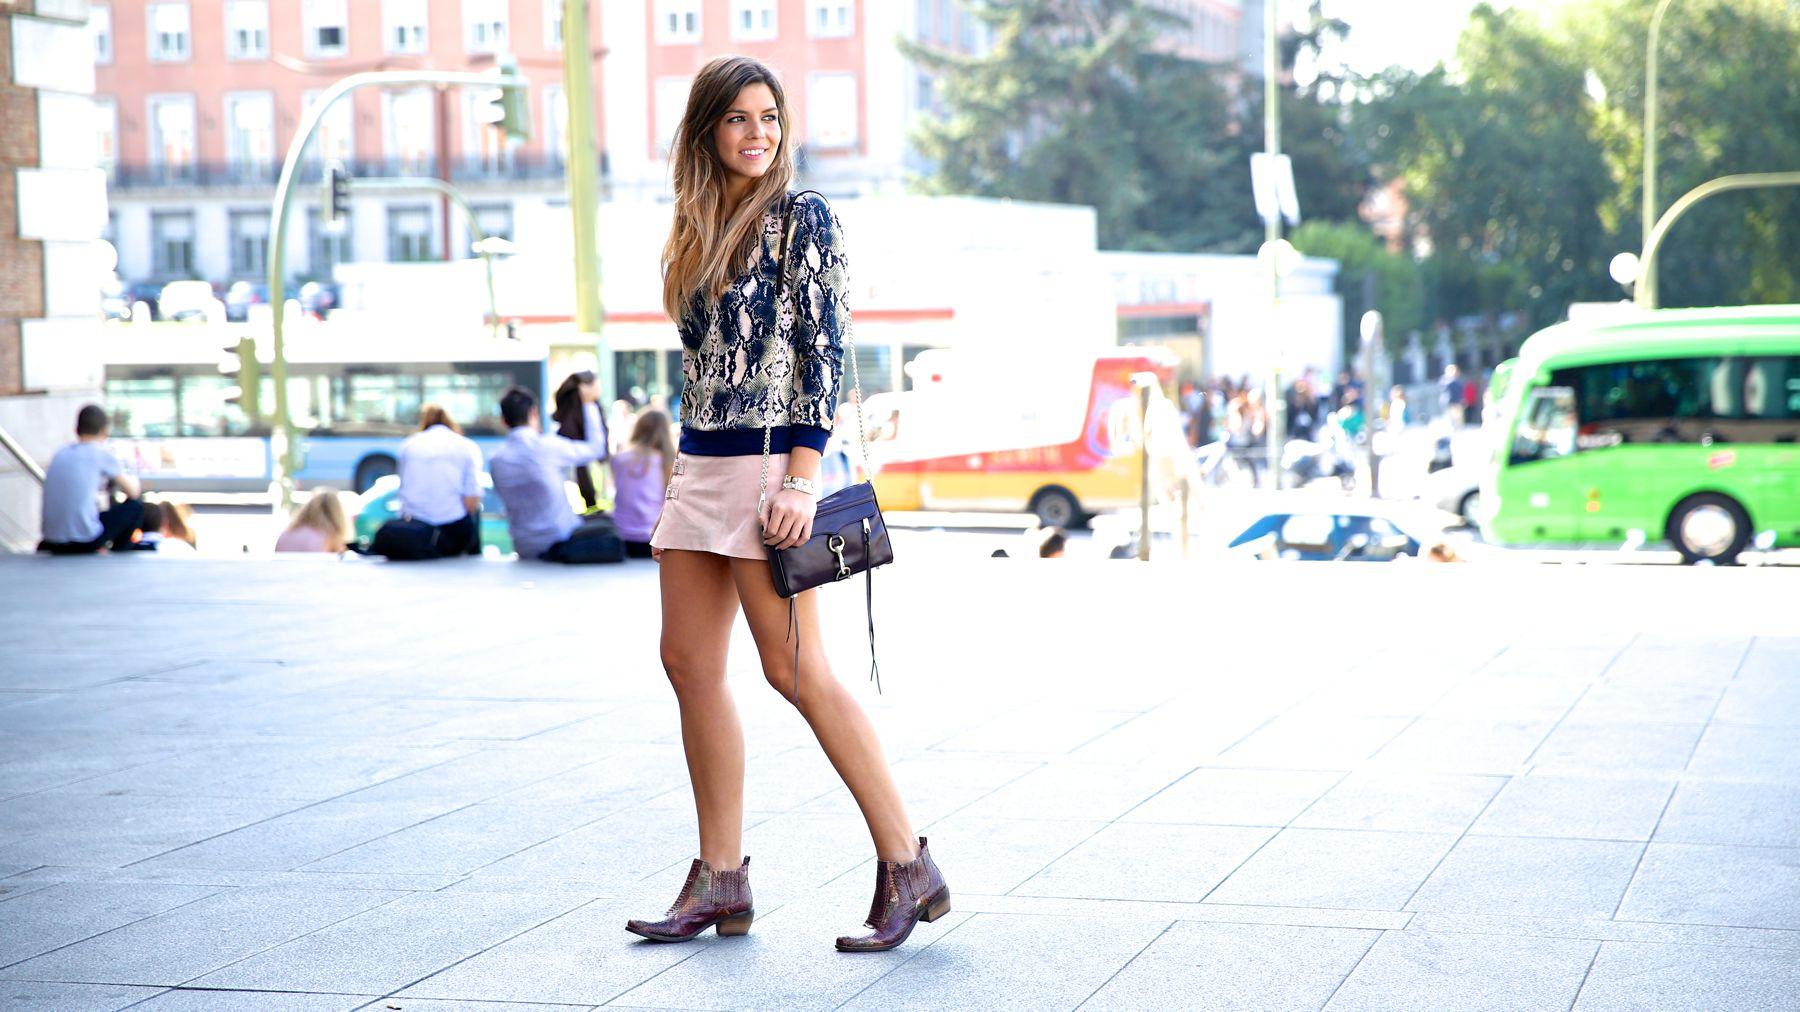 trendy_taste-look-outfit-street_style-ootd-blog-blogger-fashion_spain-moda_españa-girissima.com-sweatshirt-sudadera-estampado-crocodile-cocodrilo-botines-booties-pink_skirt-falda_rosa-7